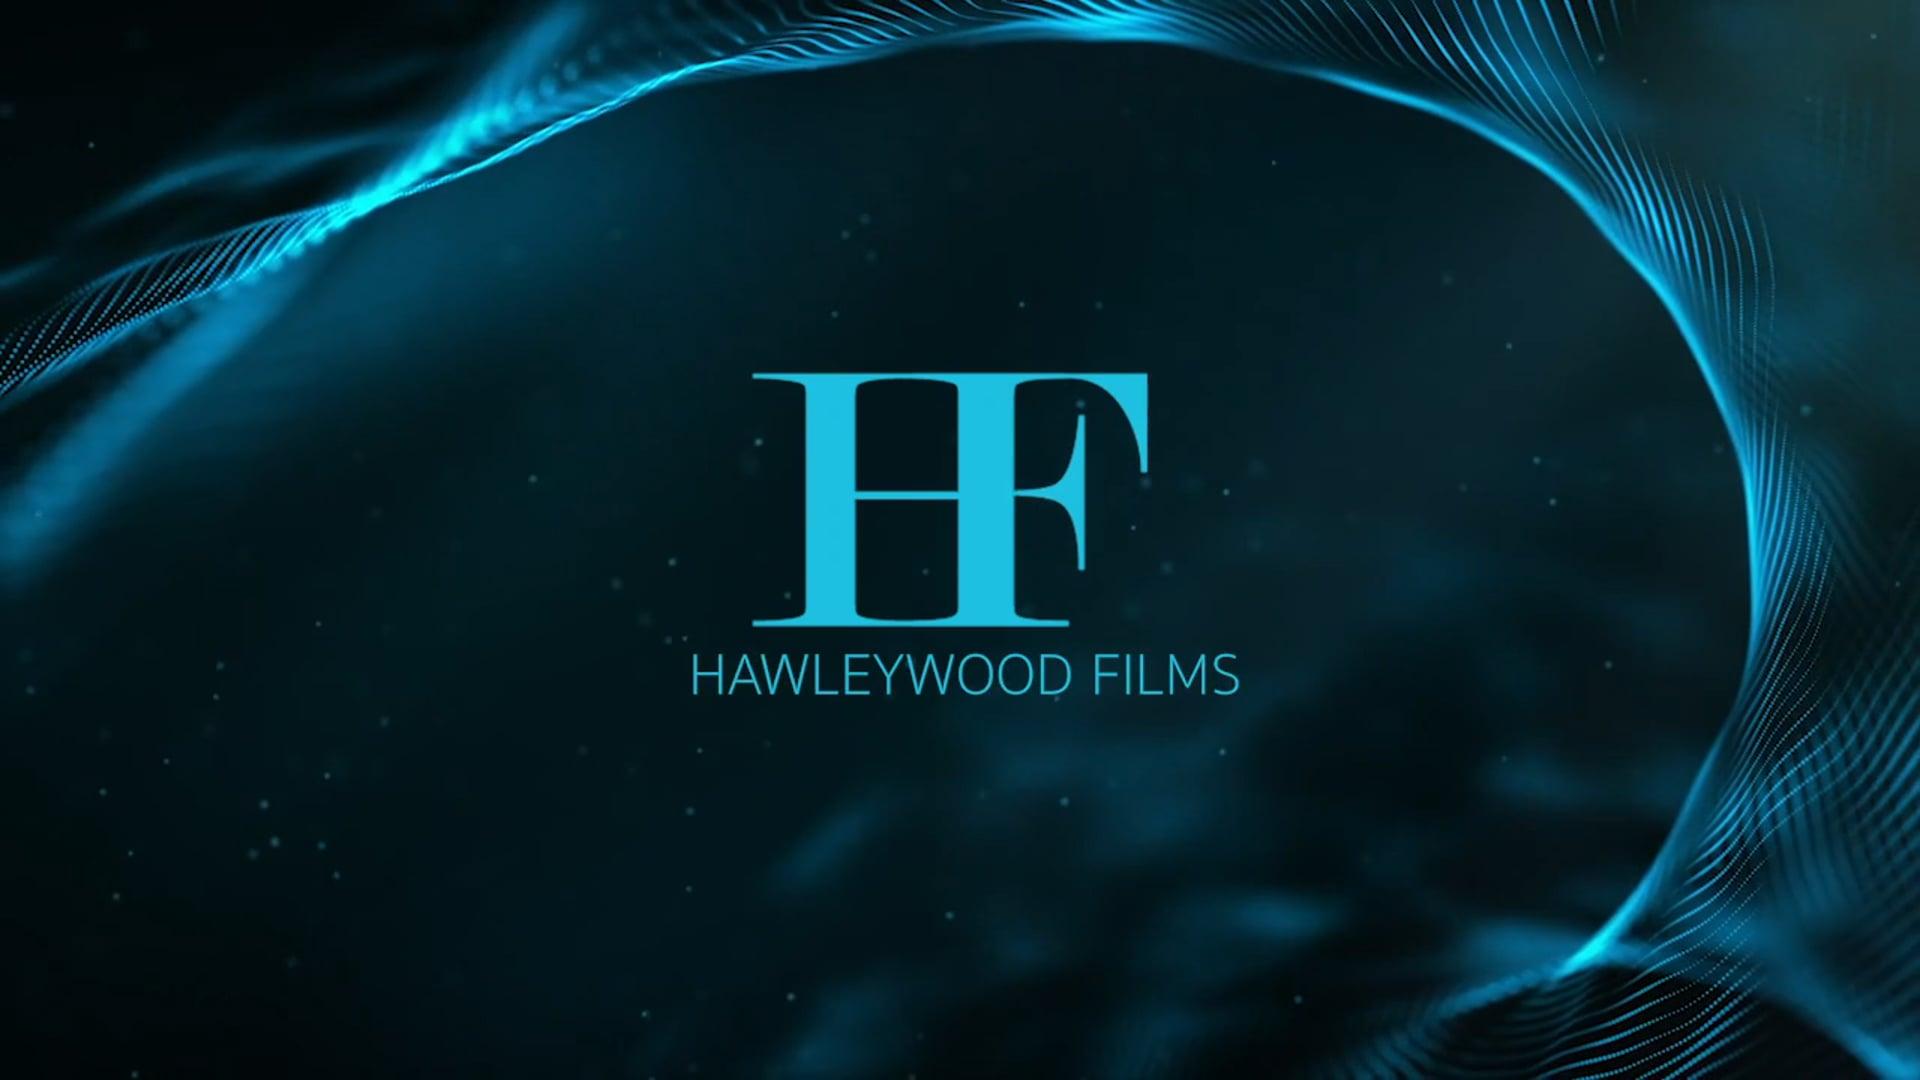 Hawleywood Films - Demo 2020